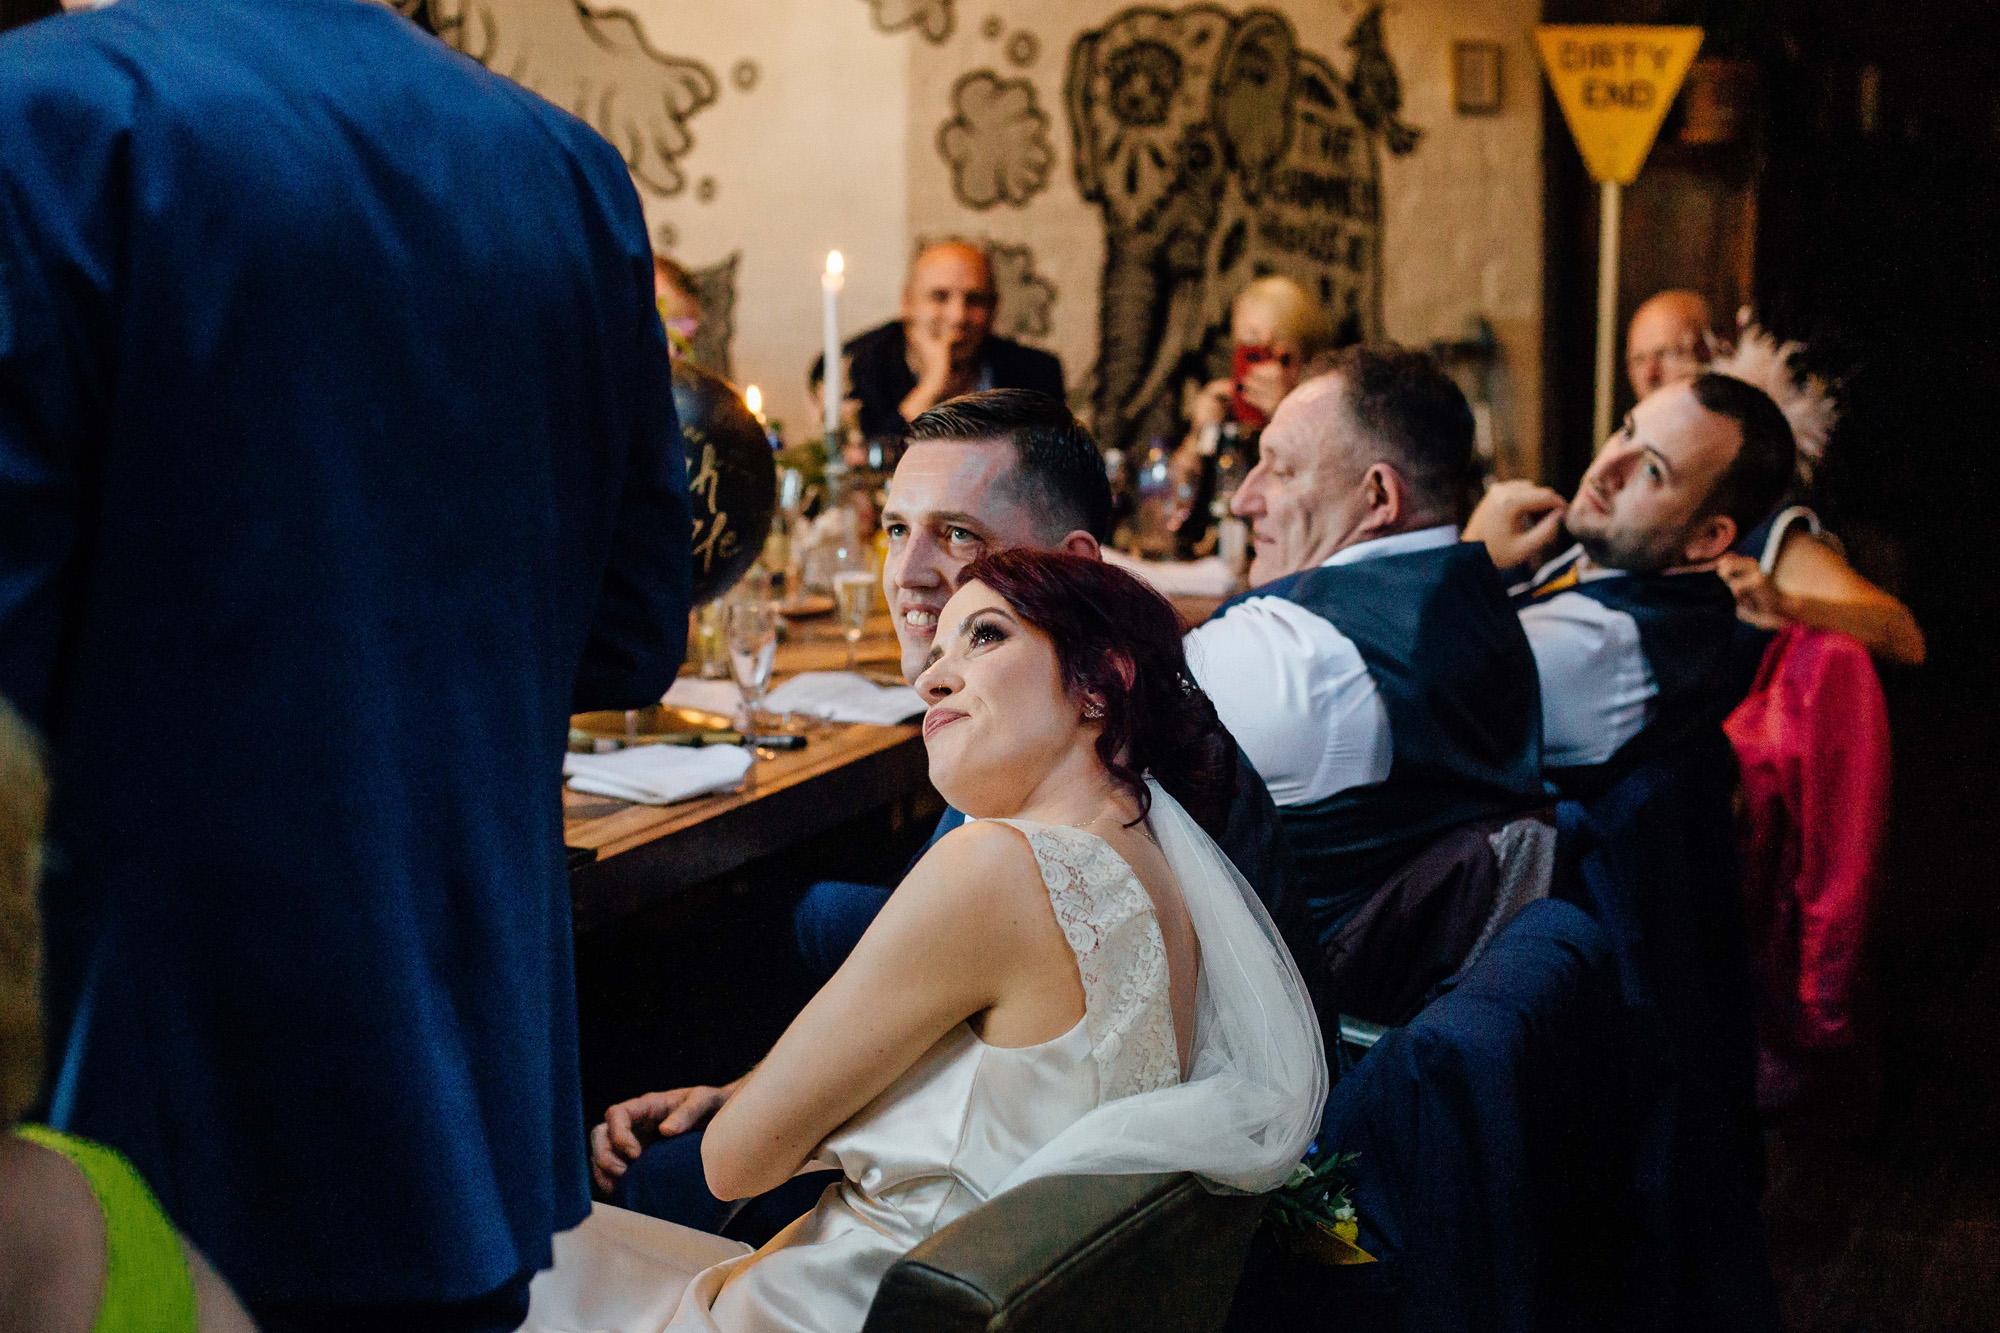 Sarah-Honeysuckle-Bias-Cut-Silk-Vintage-Inspired-Wedding-Gown-Sheffield-Wedding-Kate-Beaumont-48.jpg